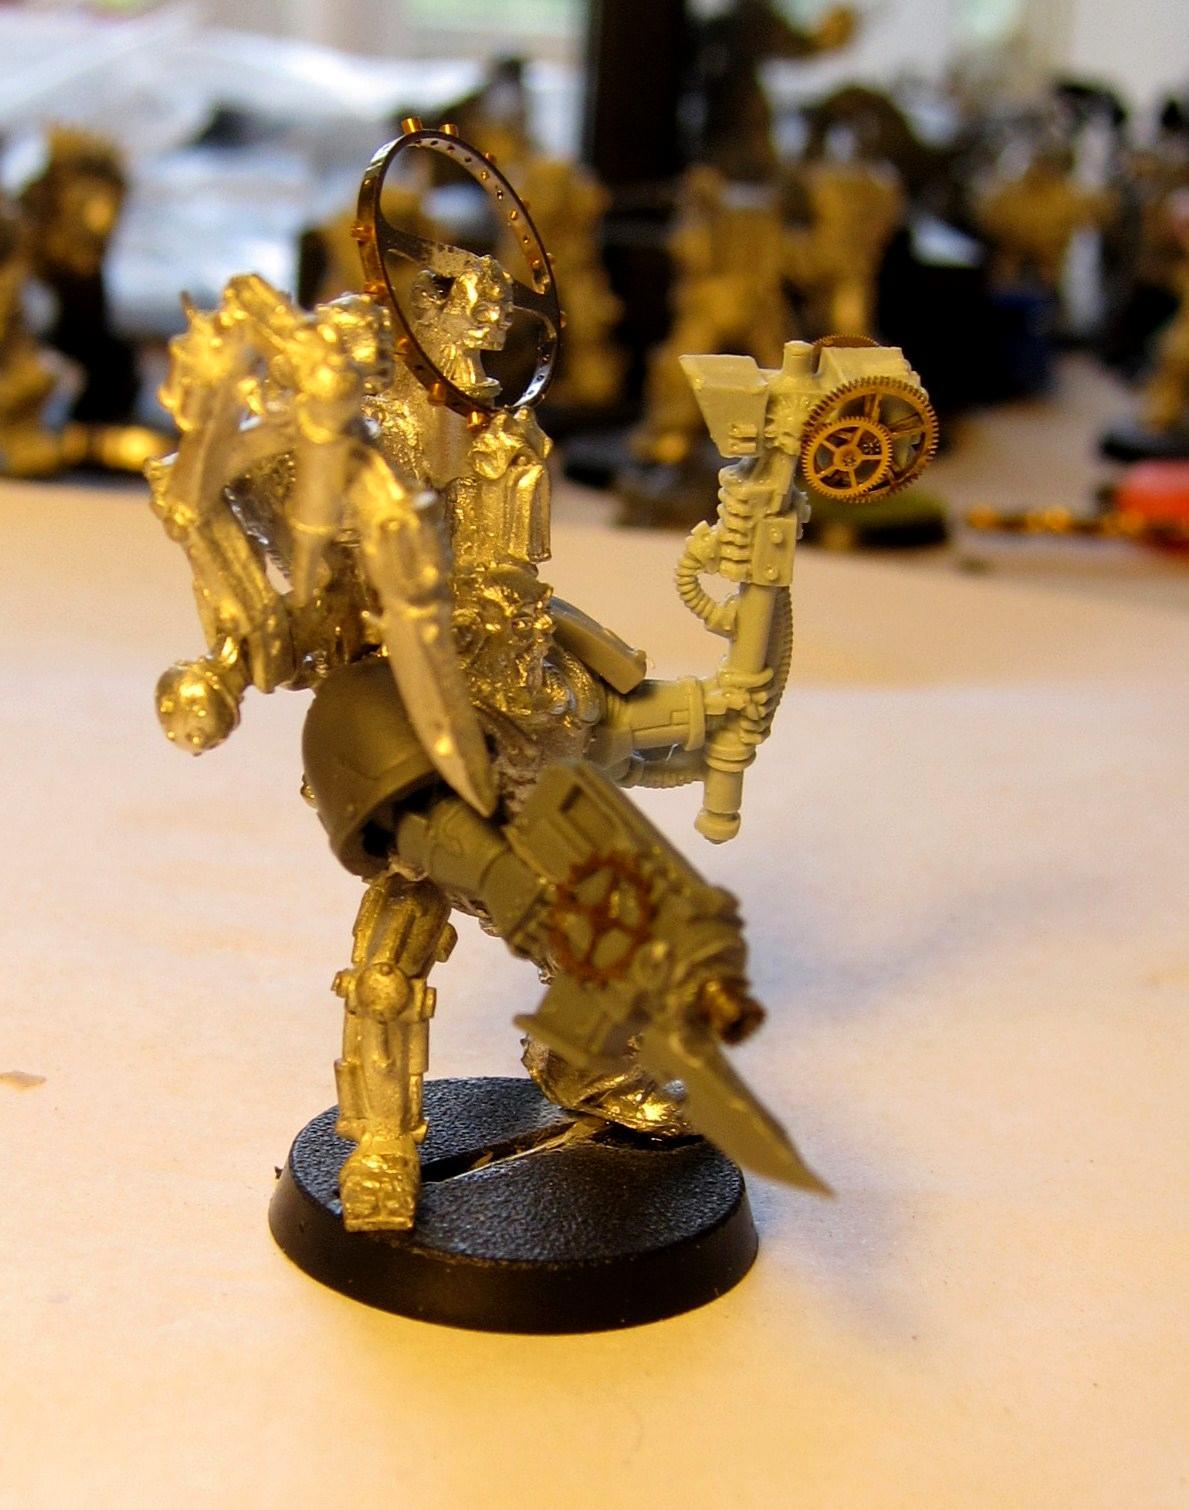 Admech, Chaos, Conversion, Dark Mechanicus, Iron Warriors, Mechanicus, Techmarine, Warpsmith